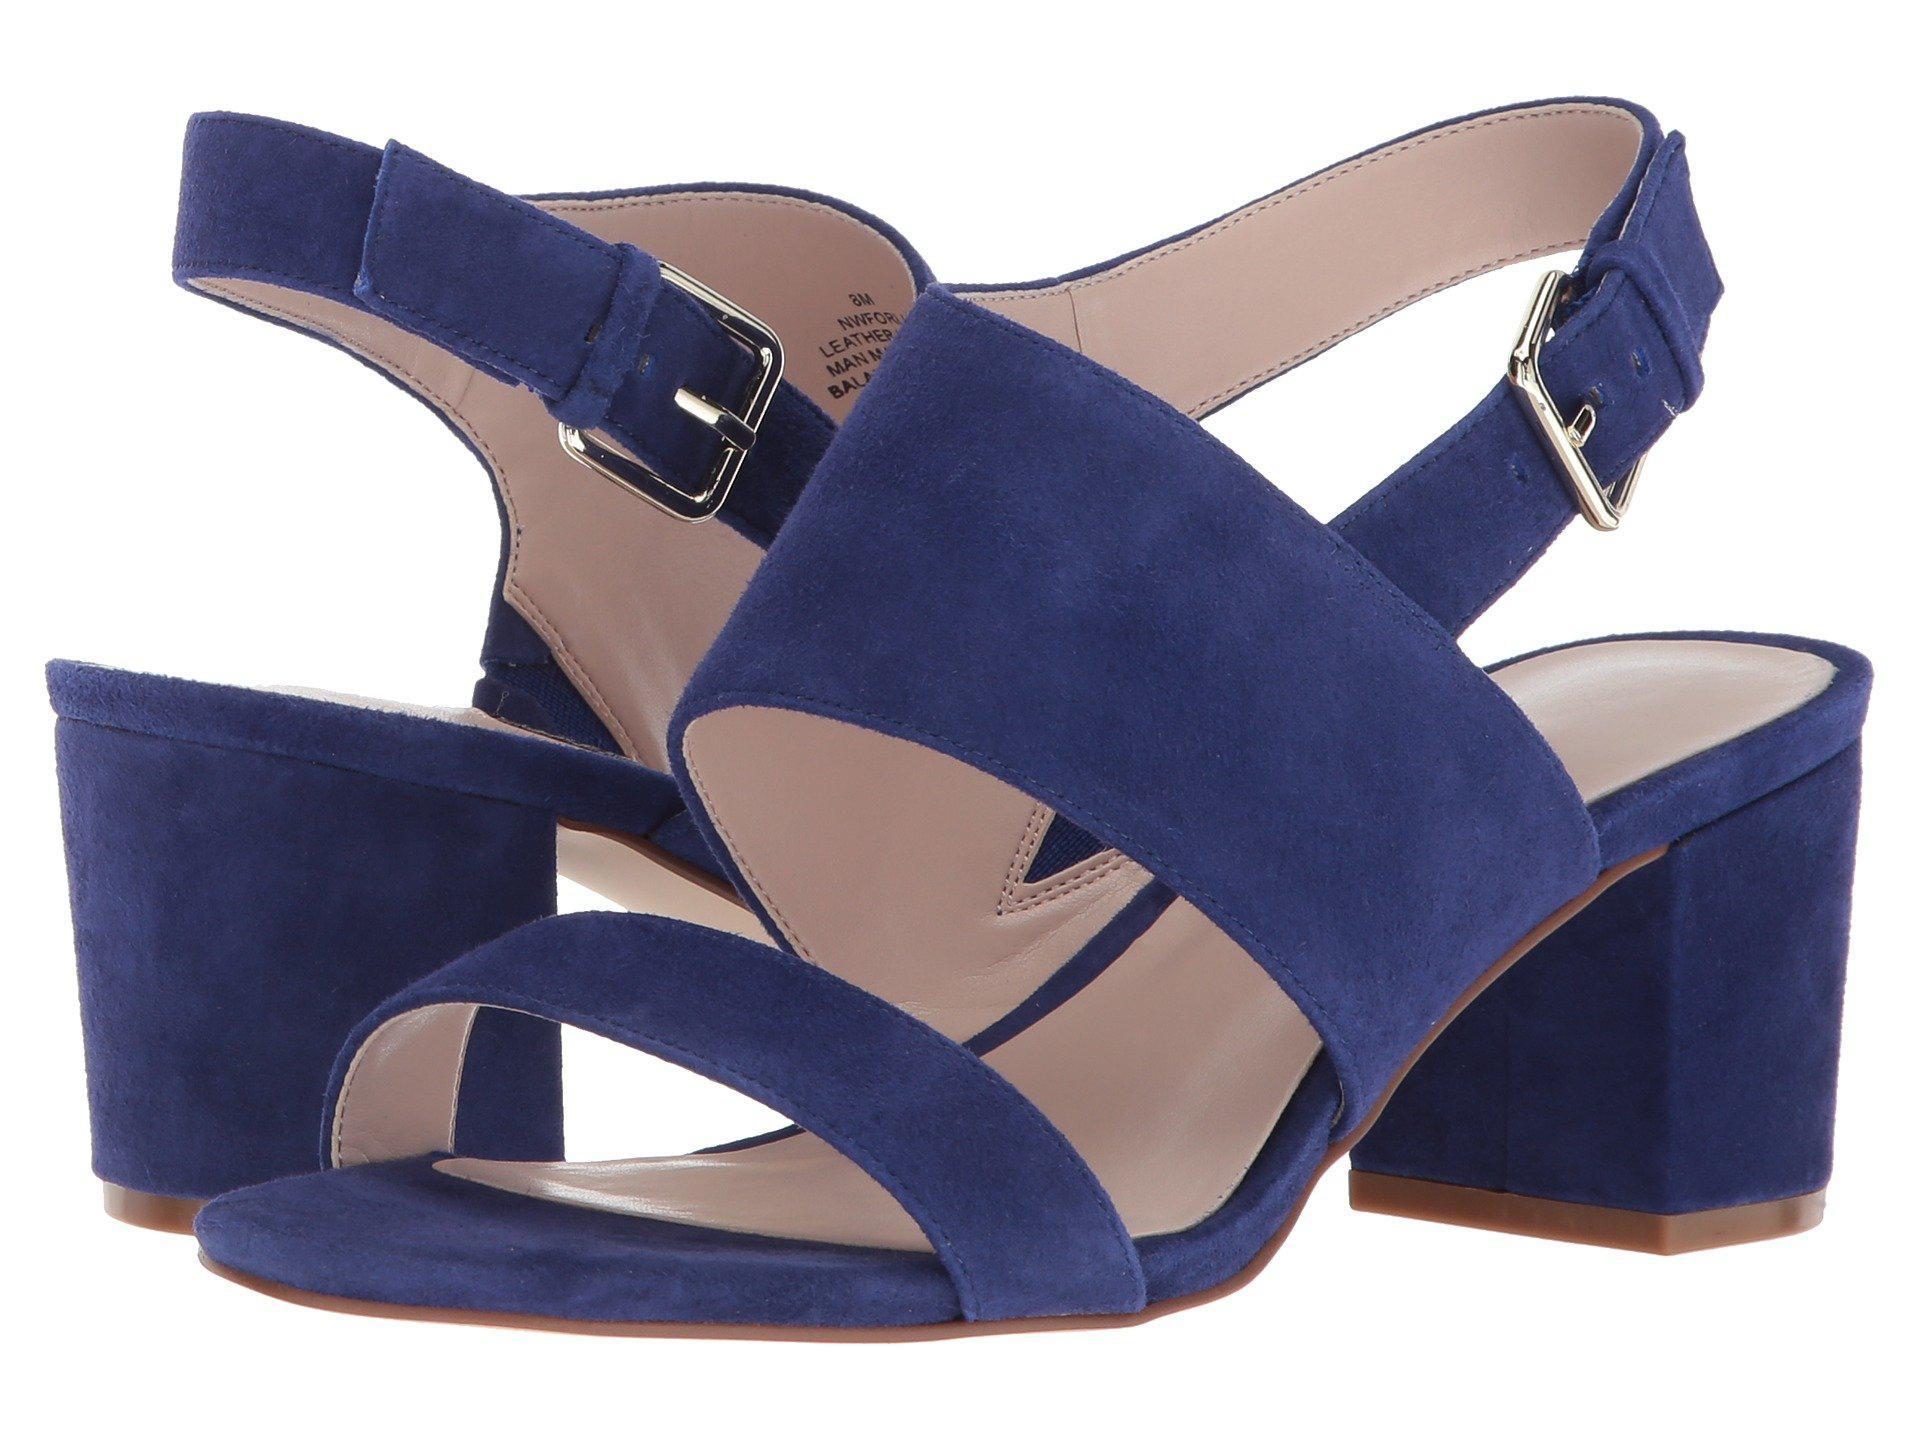 483b356f1280 Lyst - Nine West Forli Block Heel Sandal in Blue - Save 55%